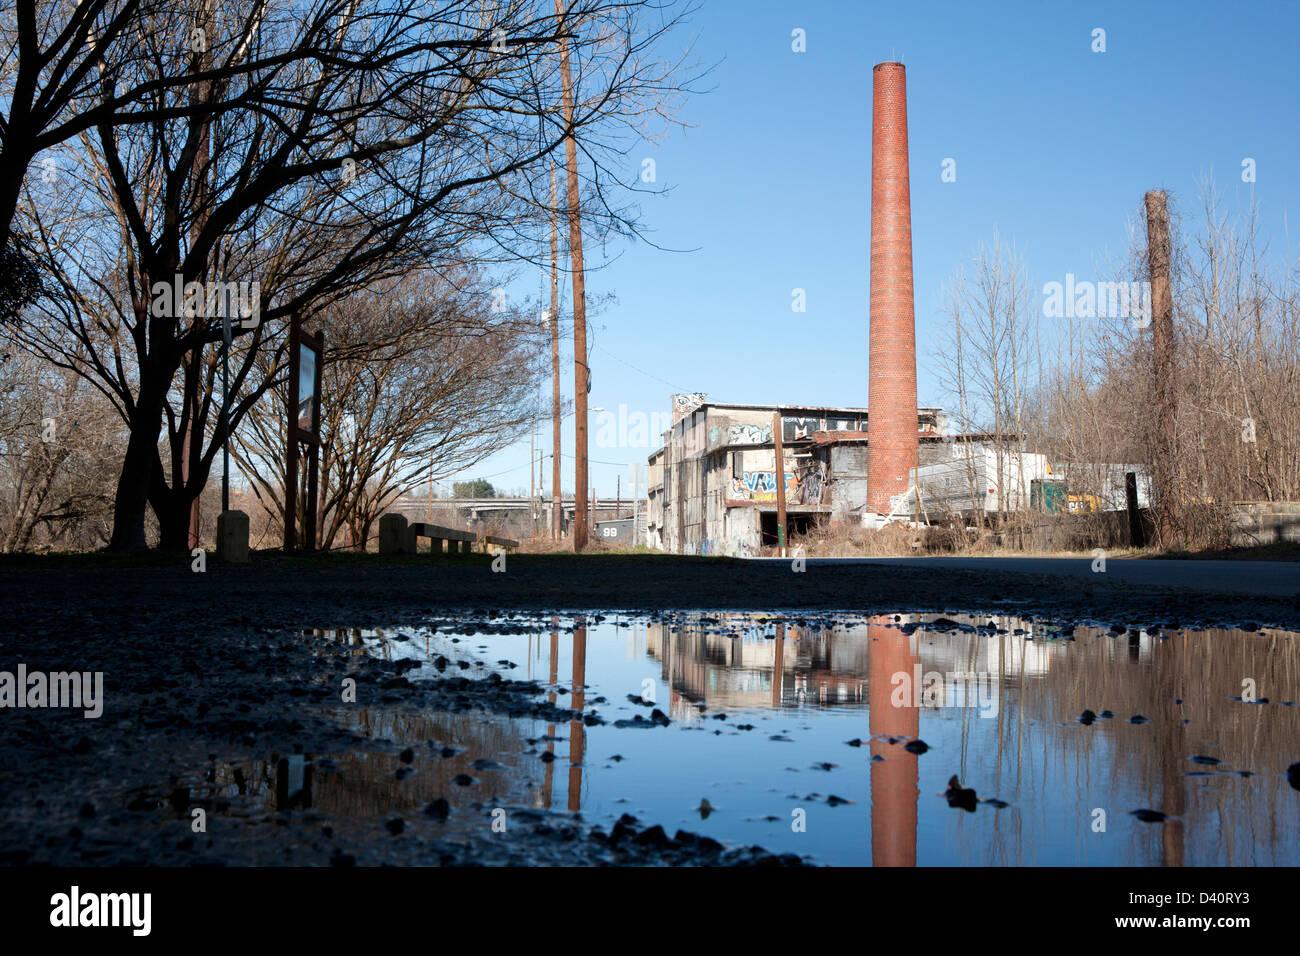 River Arts District - Asheville, North Carolina, USA - Stock Image